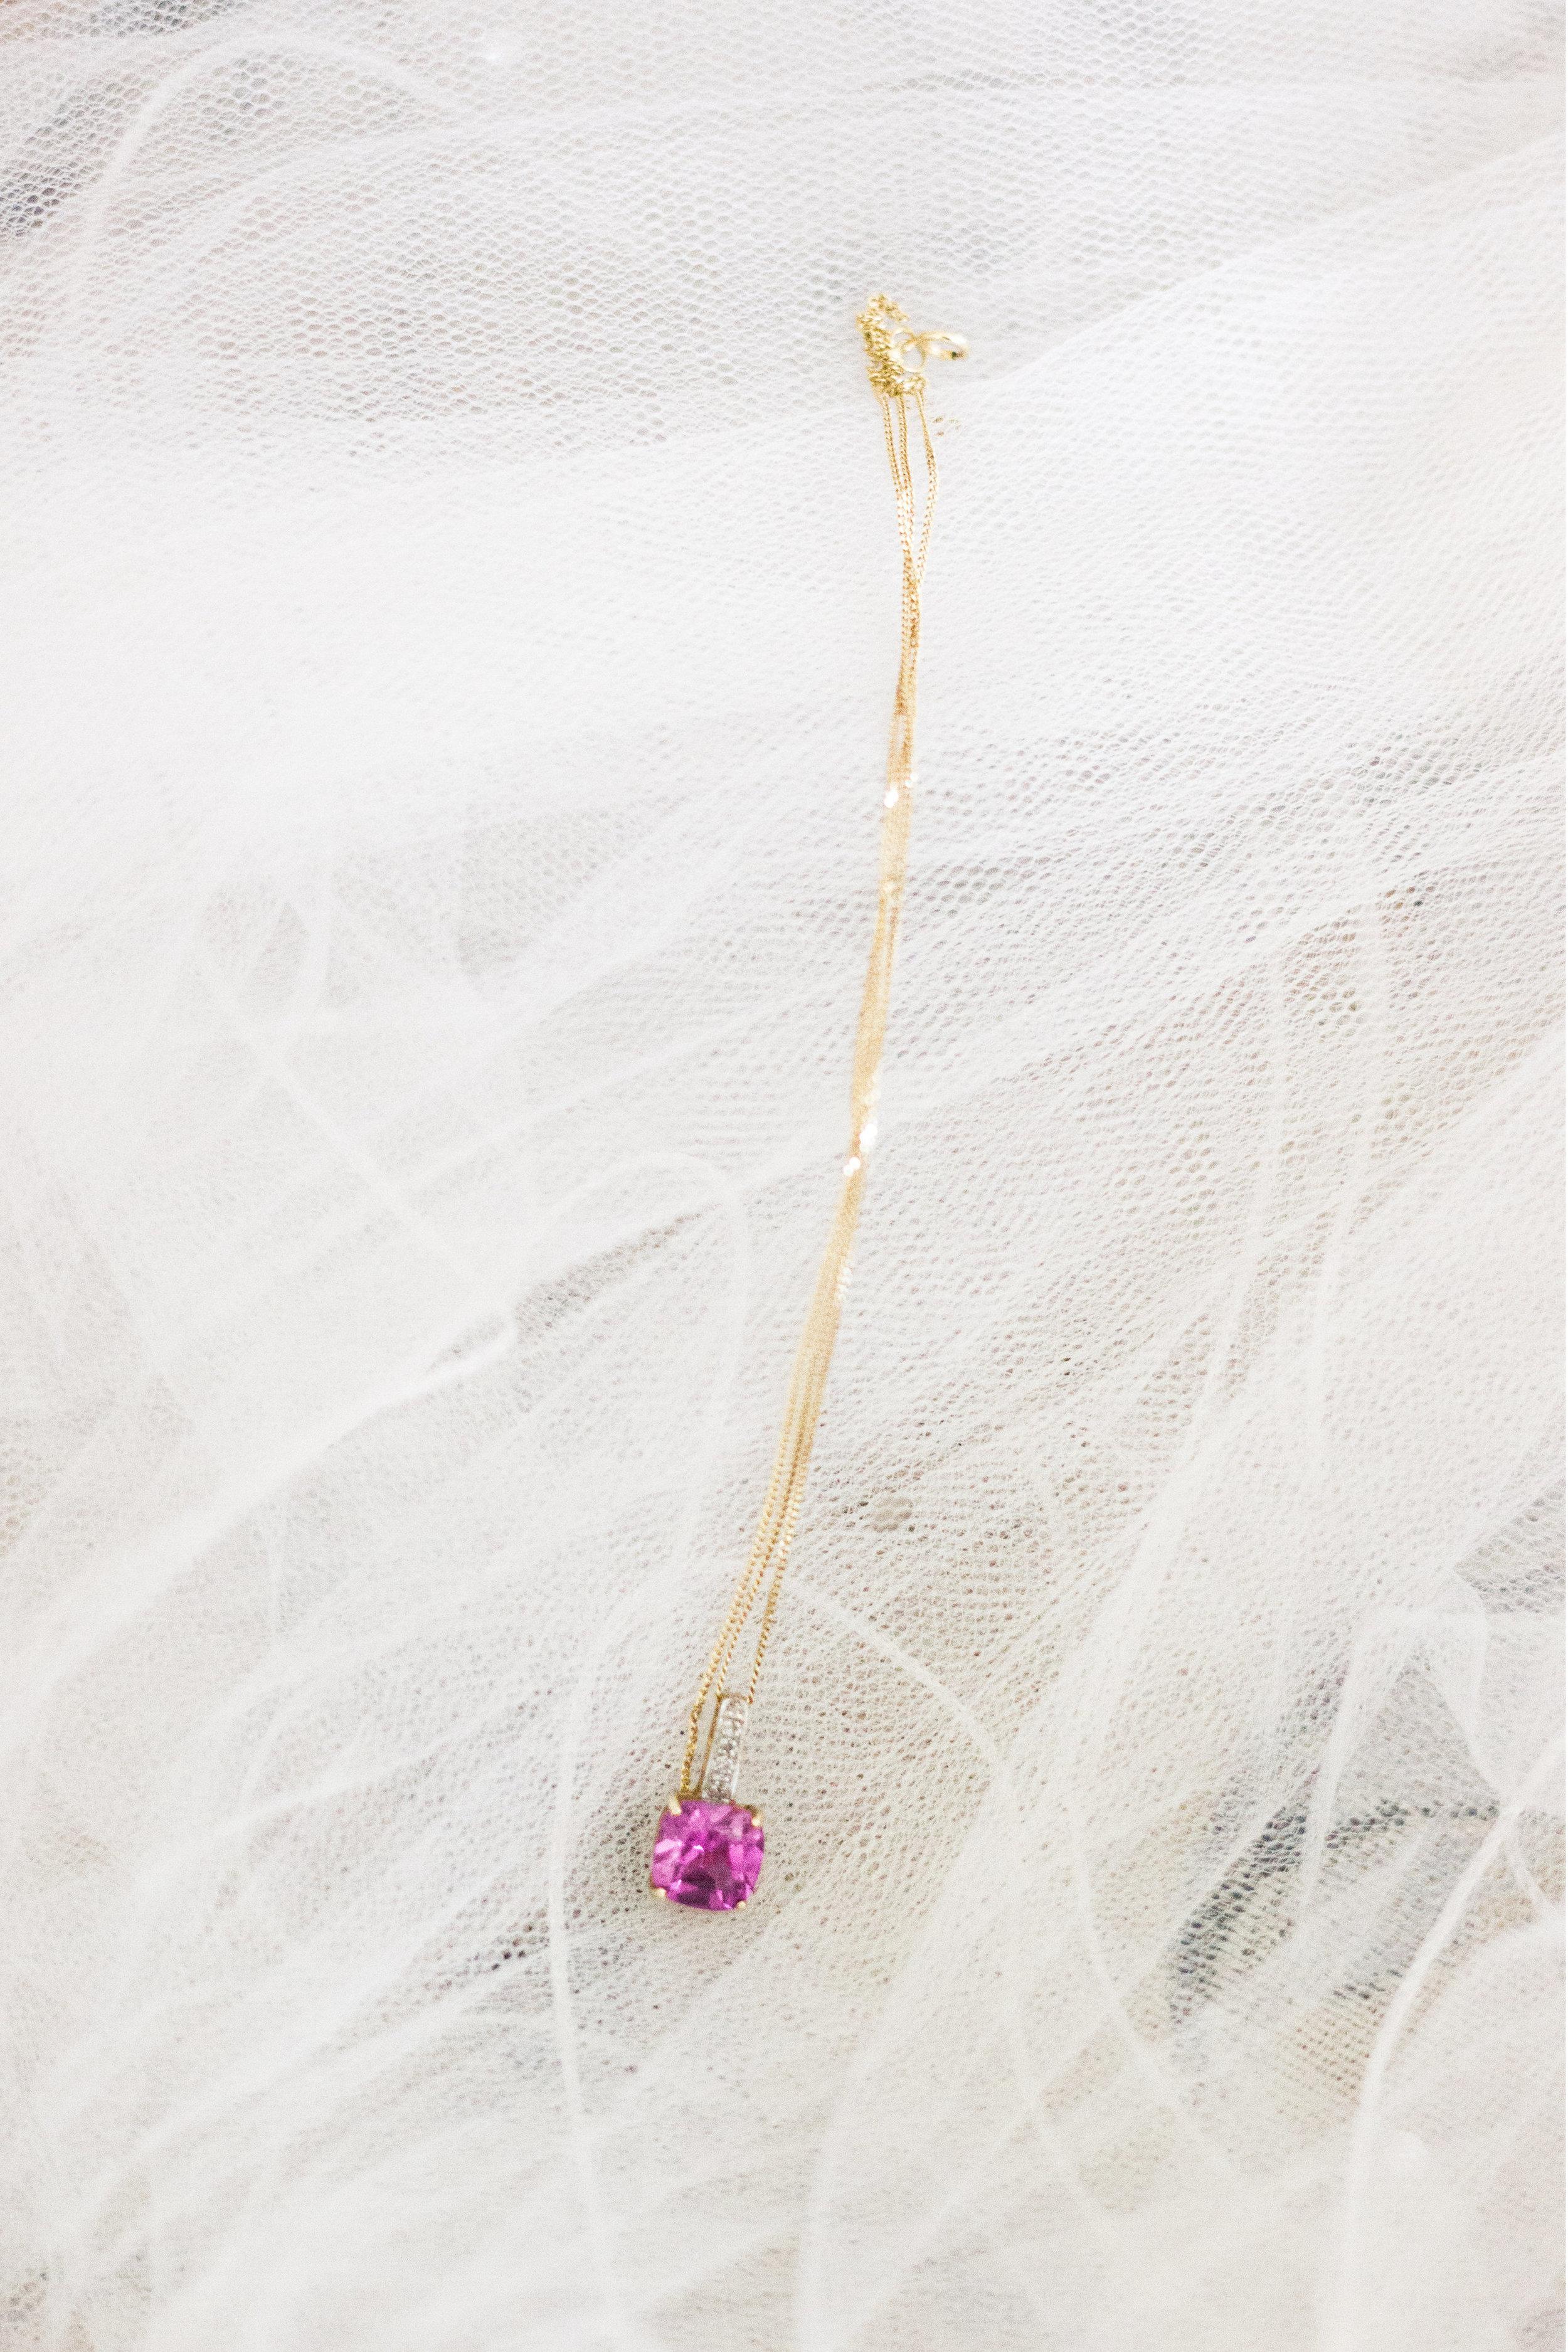 EDITS_Hayley_Christian_Wedding-0007.jpg